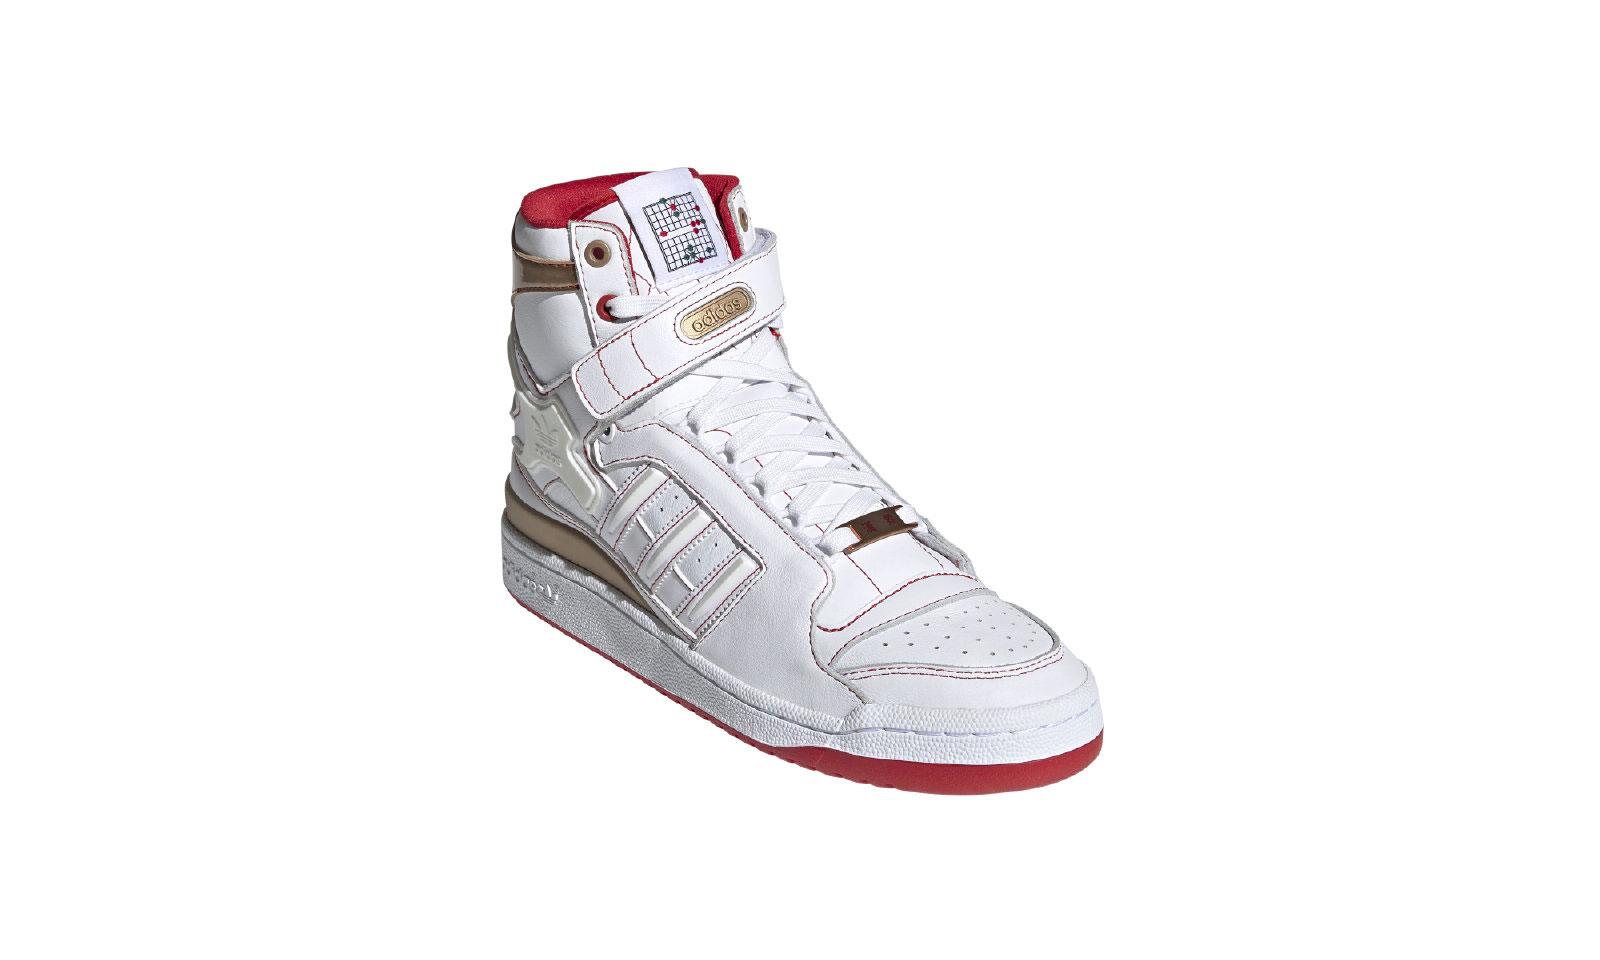 adidas Originals 两个新系列鞋款谍照曝光